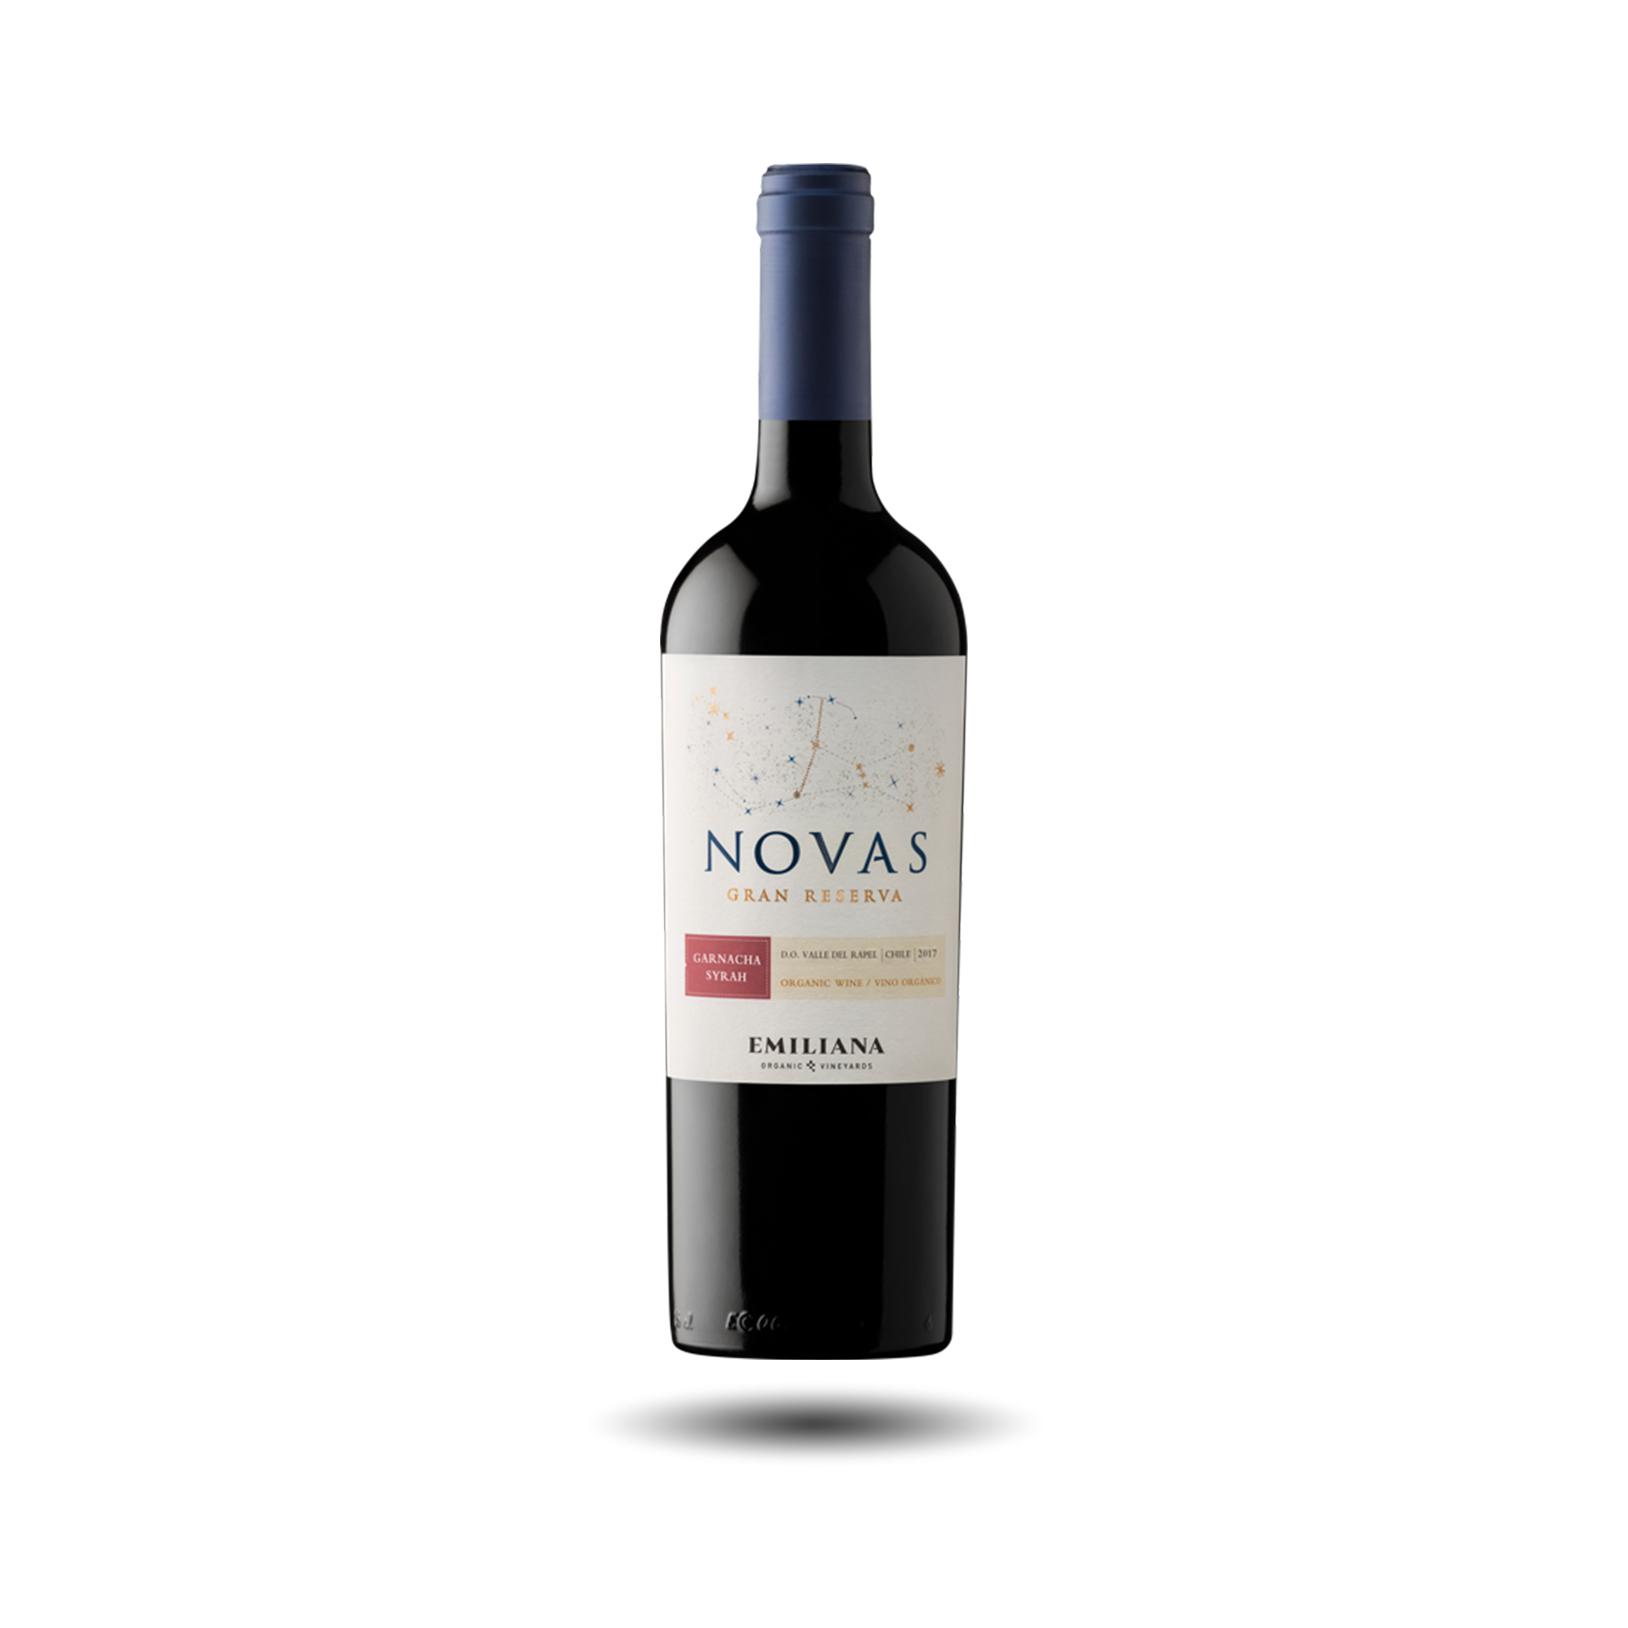 Emiliana - Novas, Syrah/Garnacha, Gran Reserva 2018